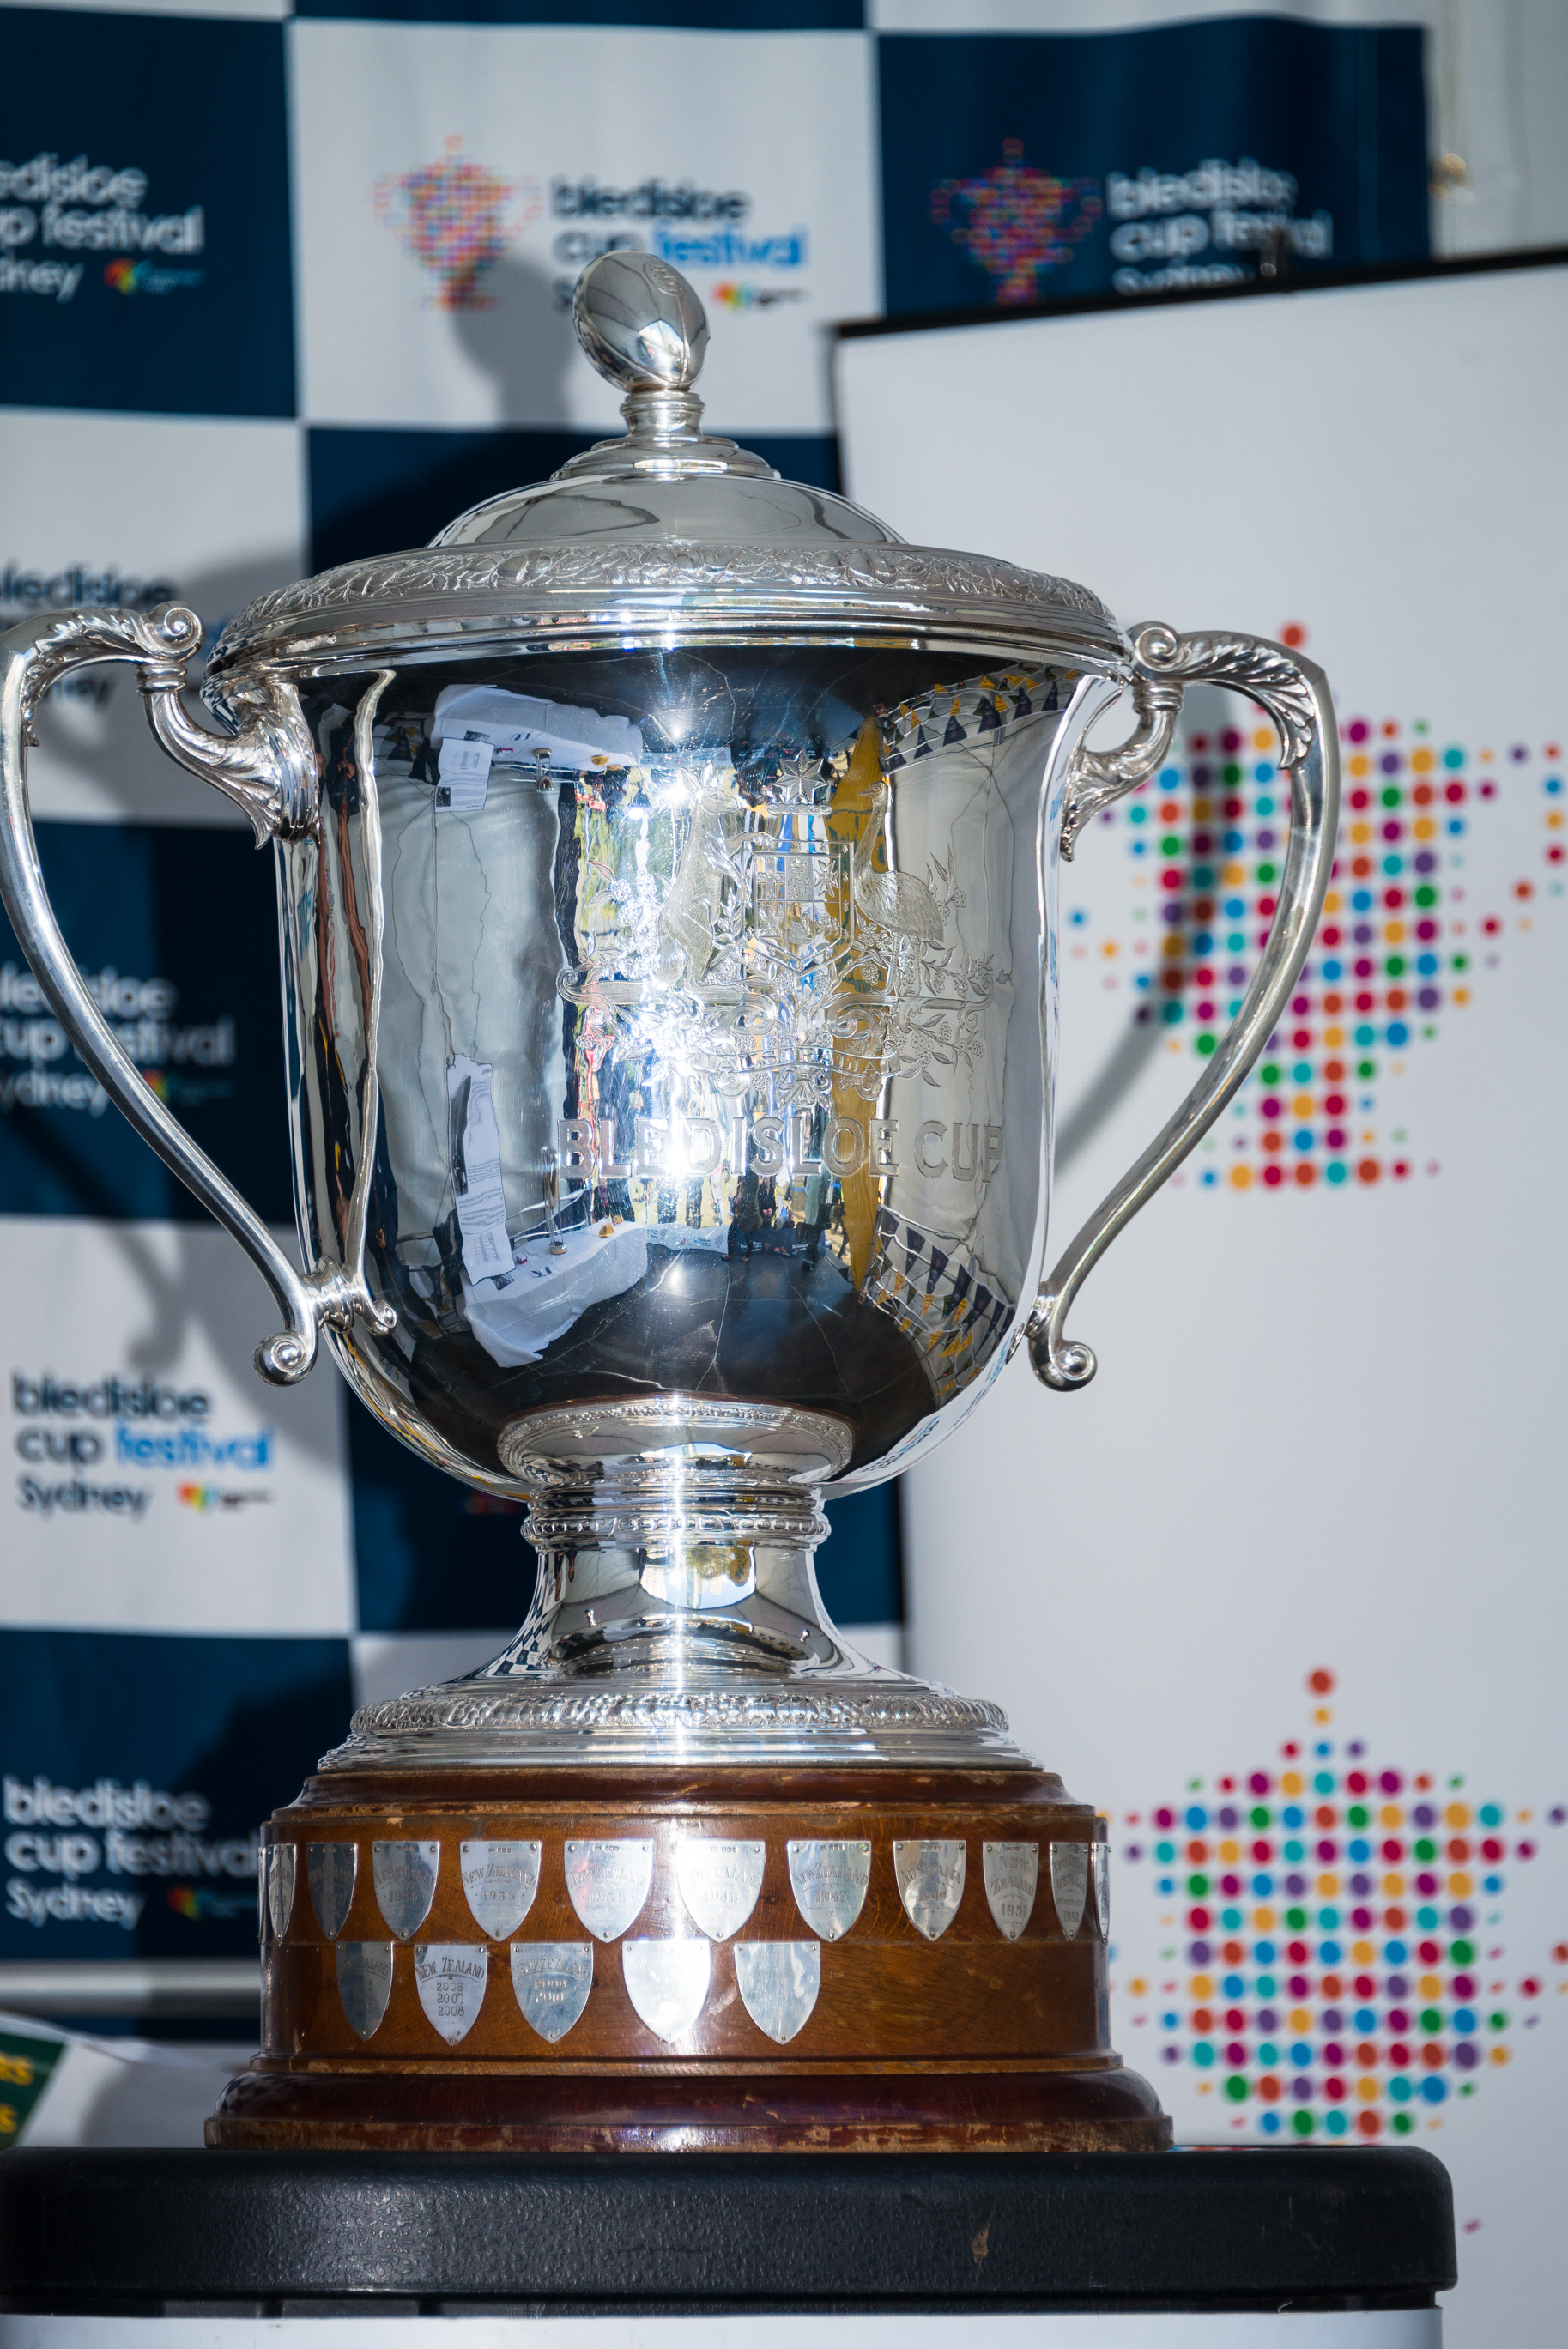 Bledisloe Cup Wikipedia